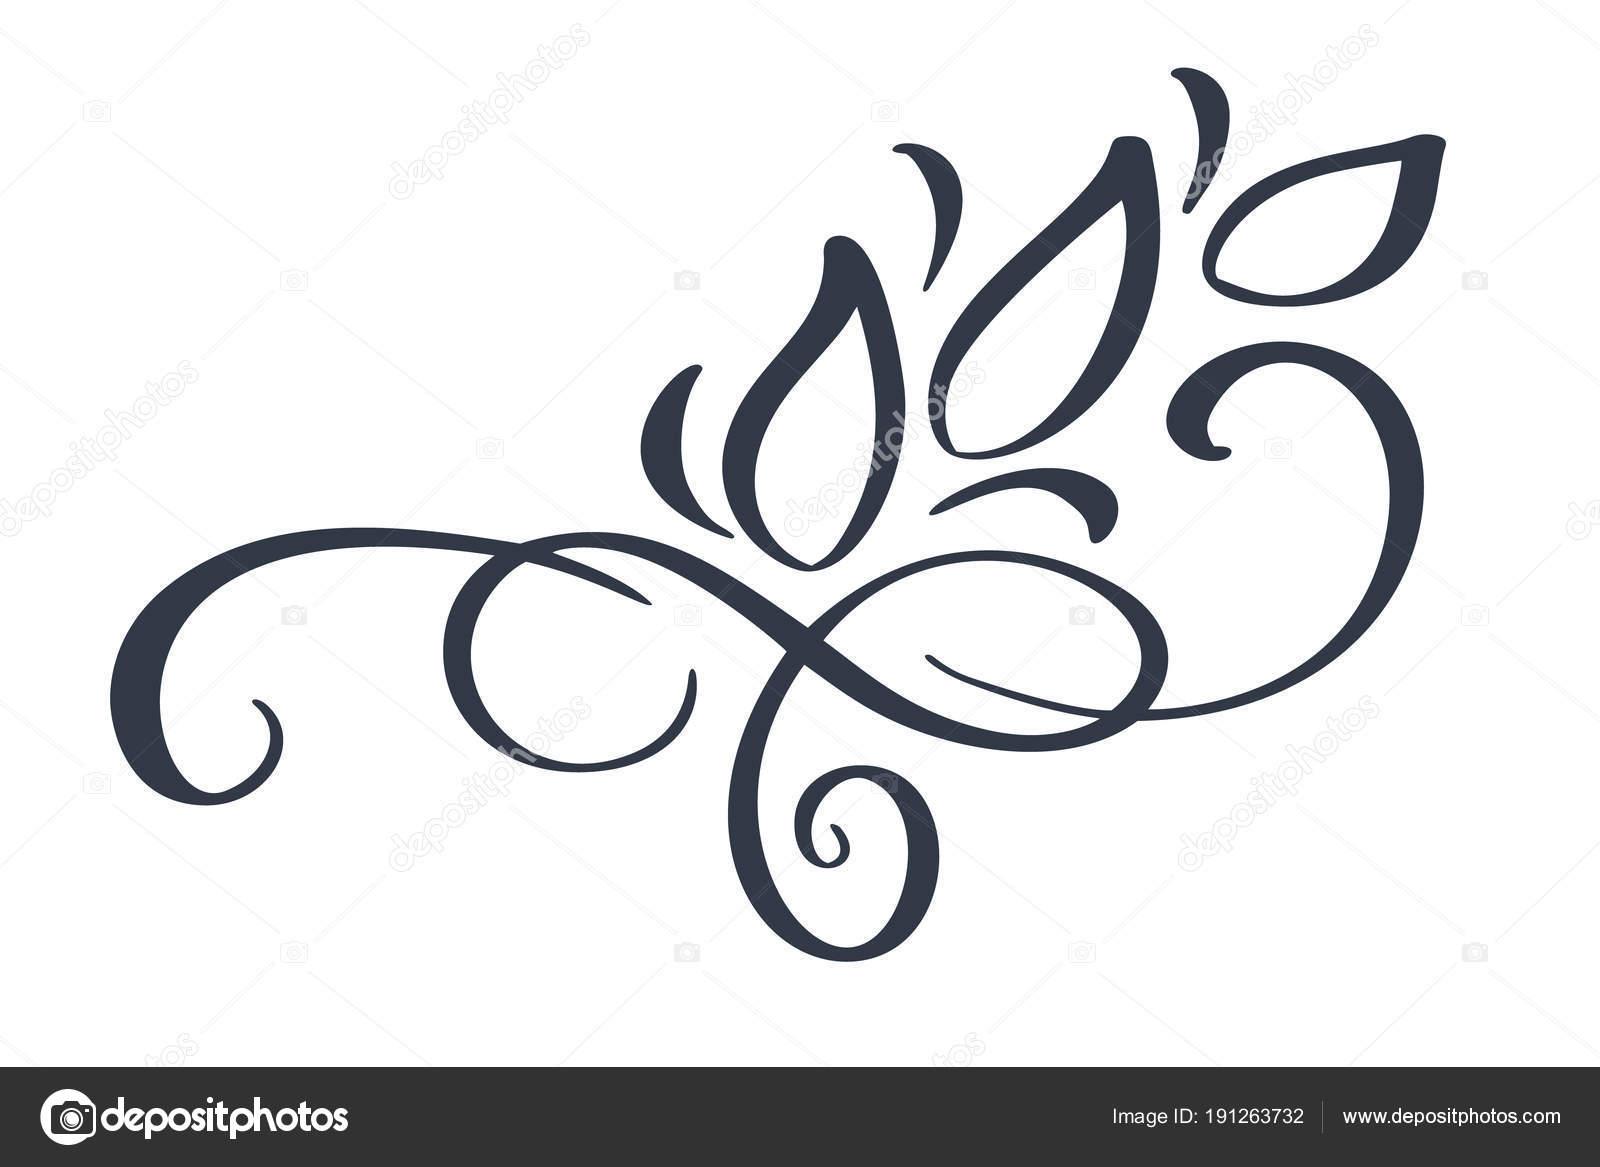 Hand Drawn Border Flourish Separator Calligraphy Designer Elements Vector Vintage Wedding Illustration Isolated On White